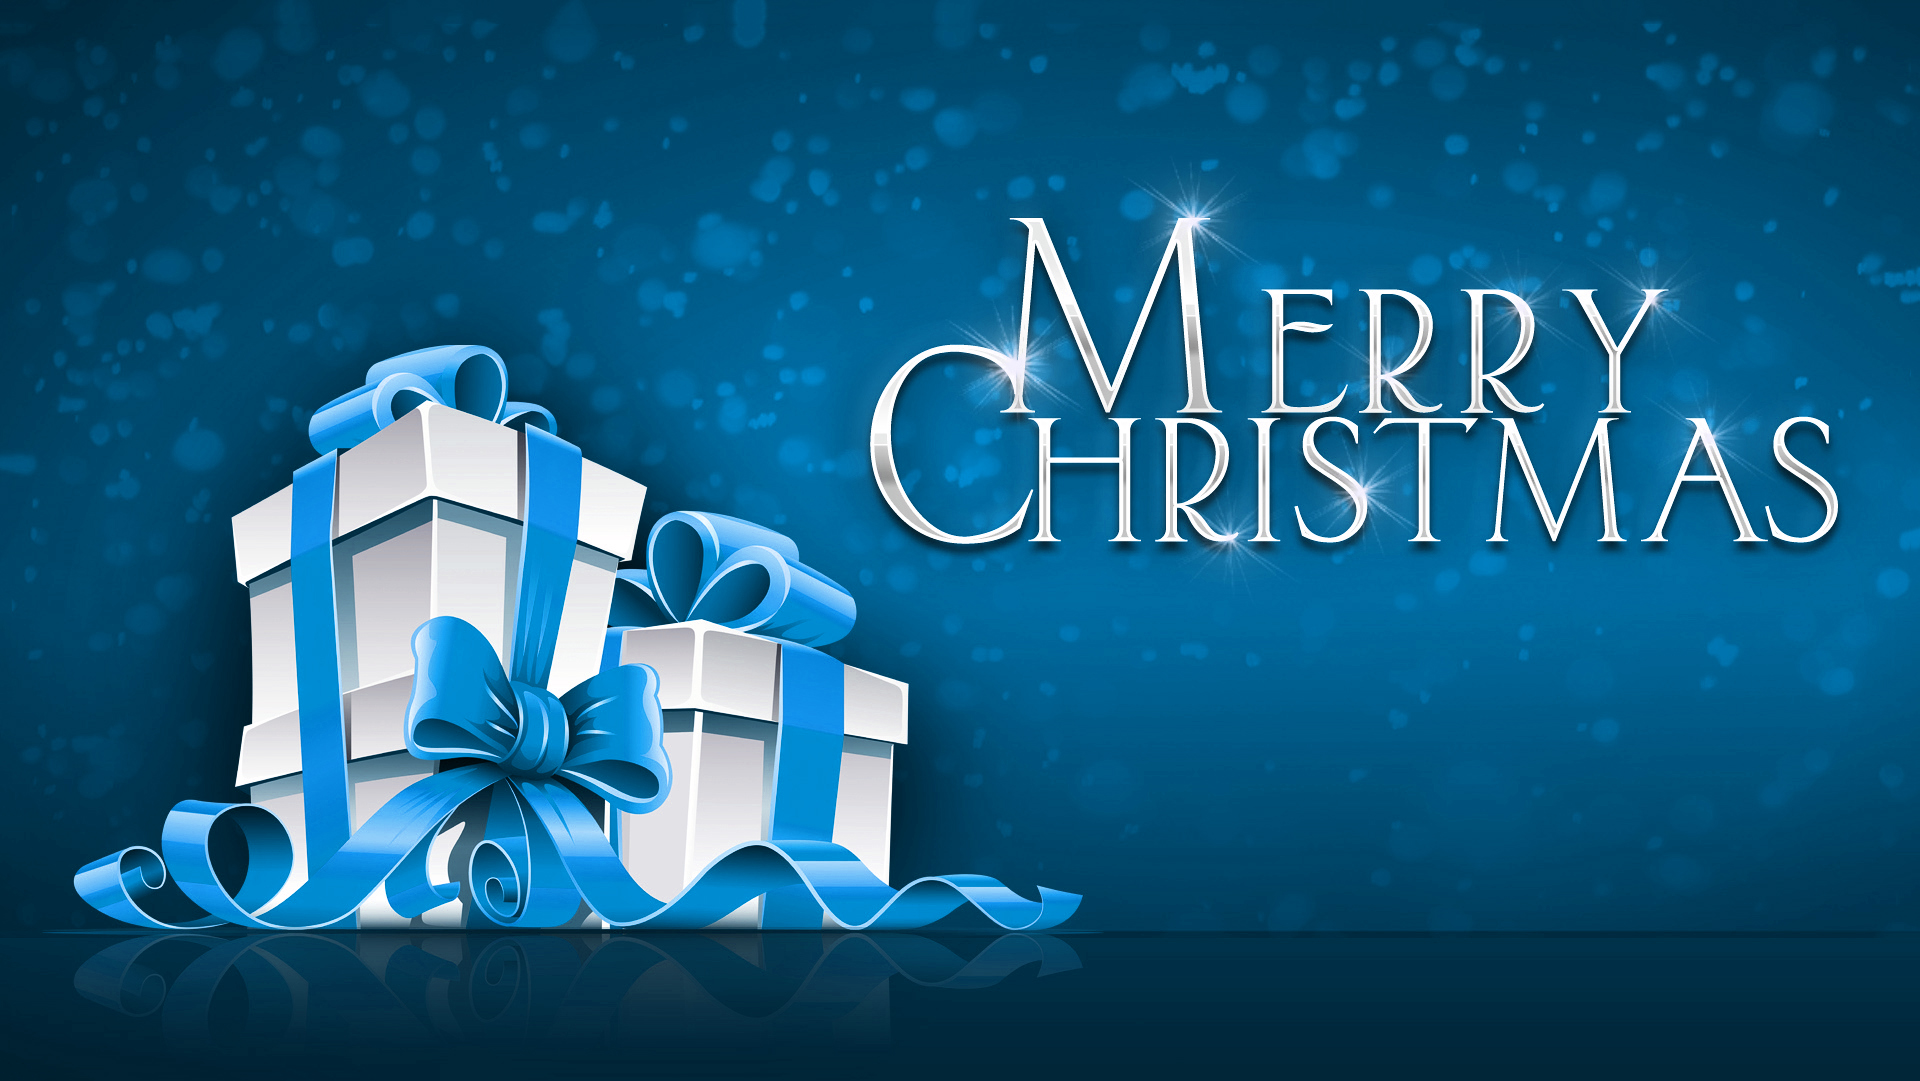 Merry Christmas Wallpaper 1920x1081